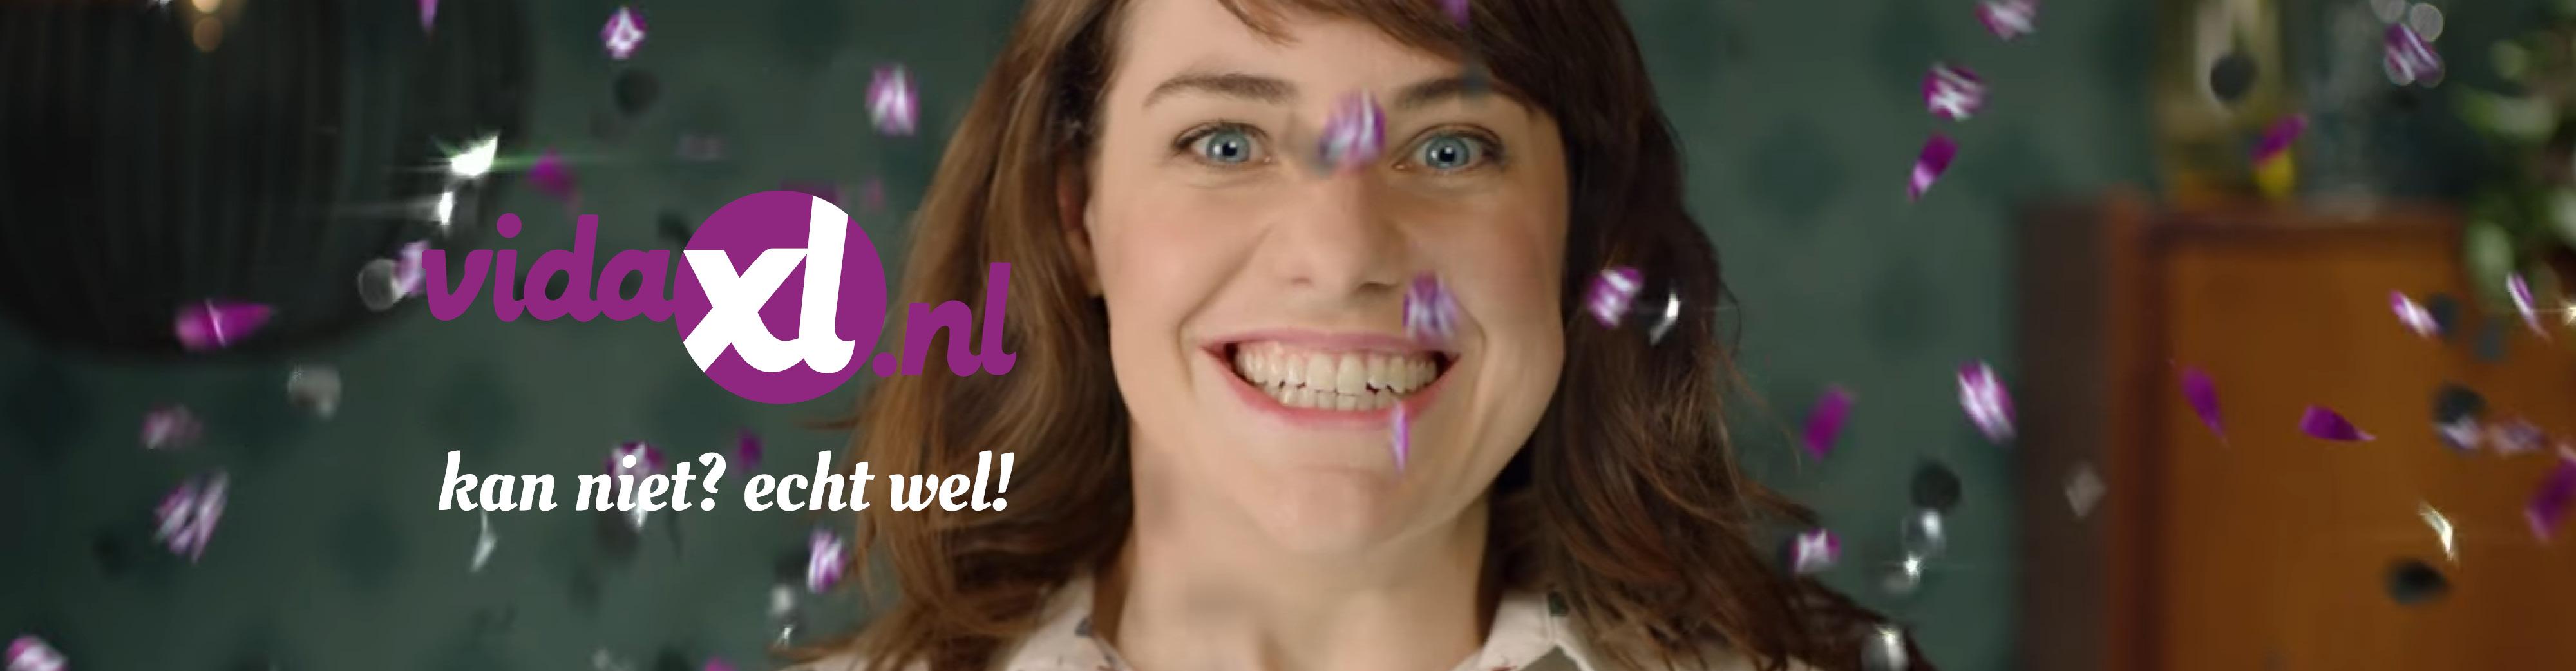 Webshopketen vidaXL nationale branding campagne